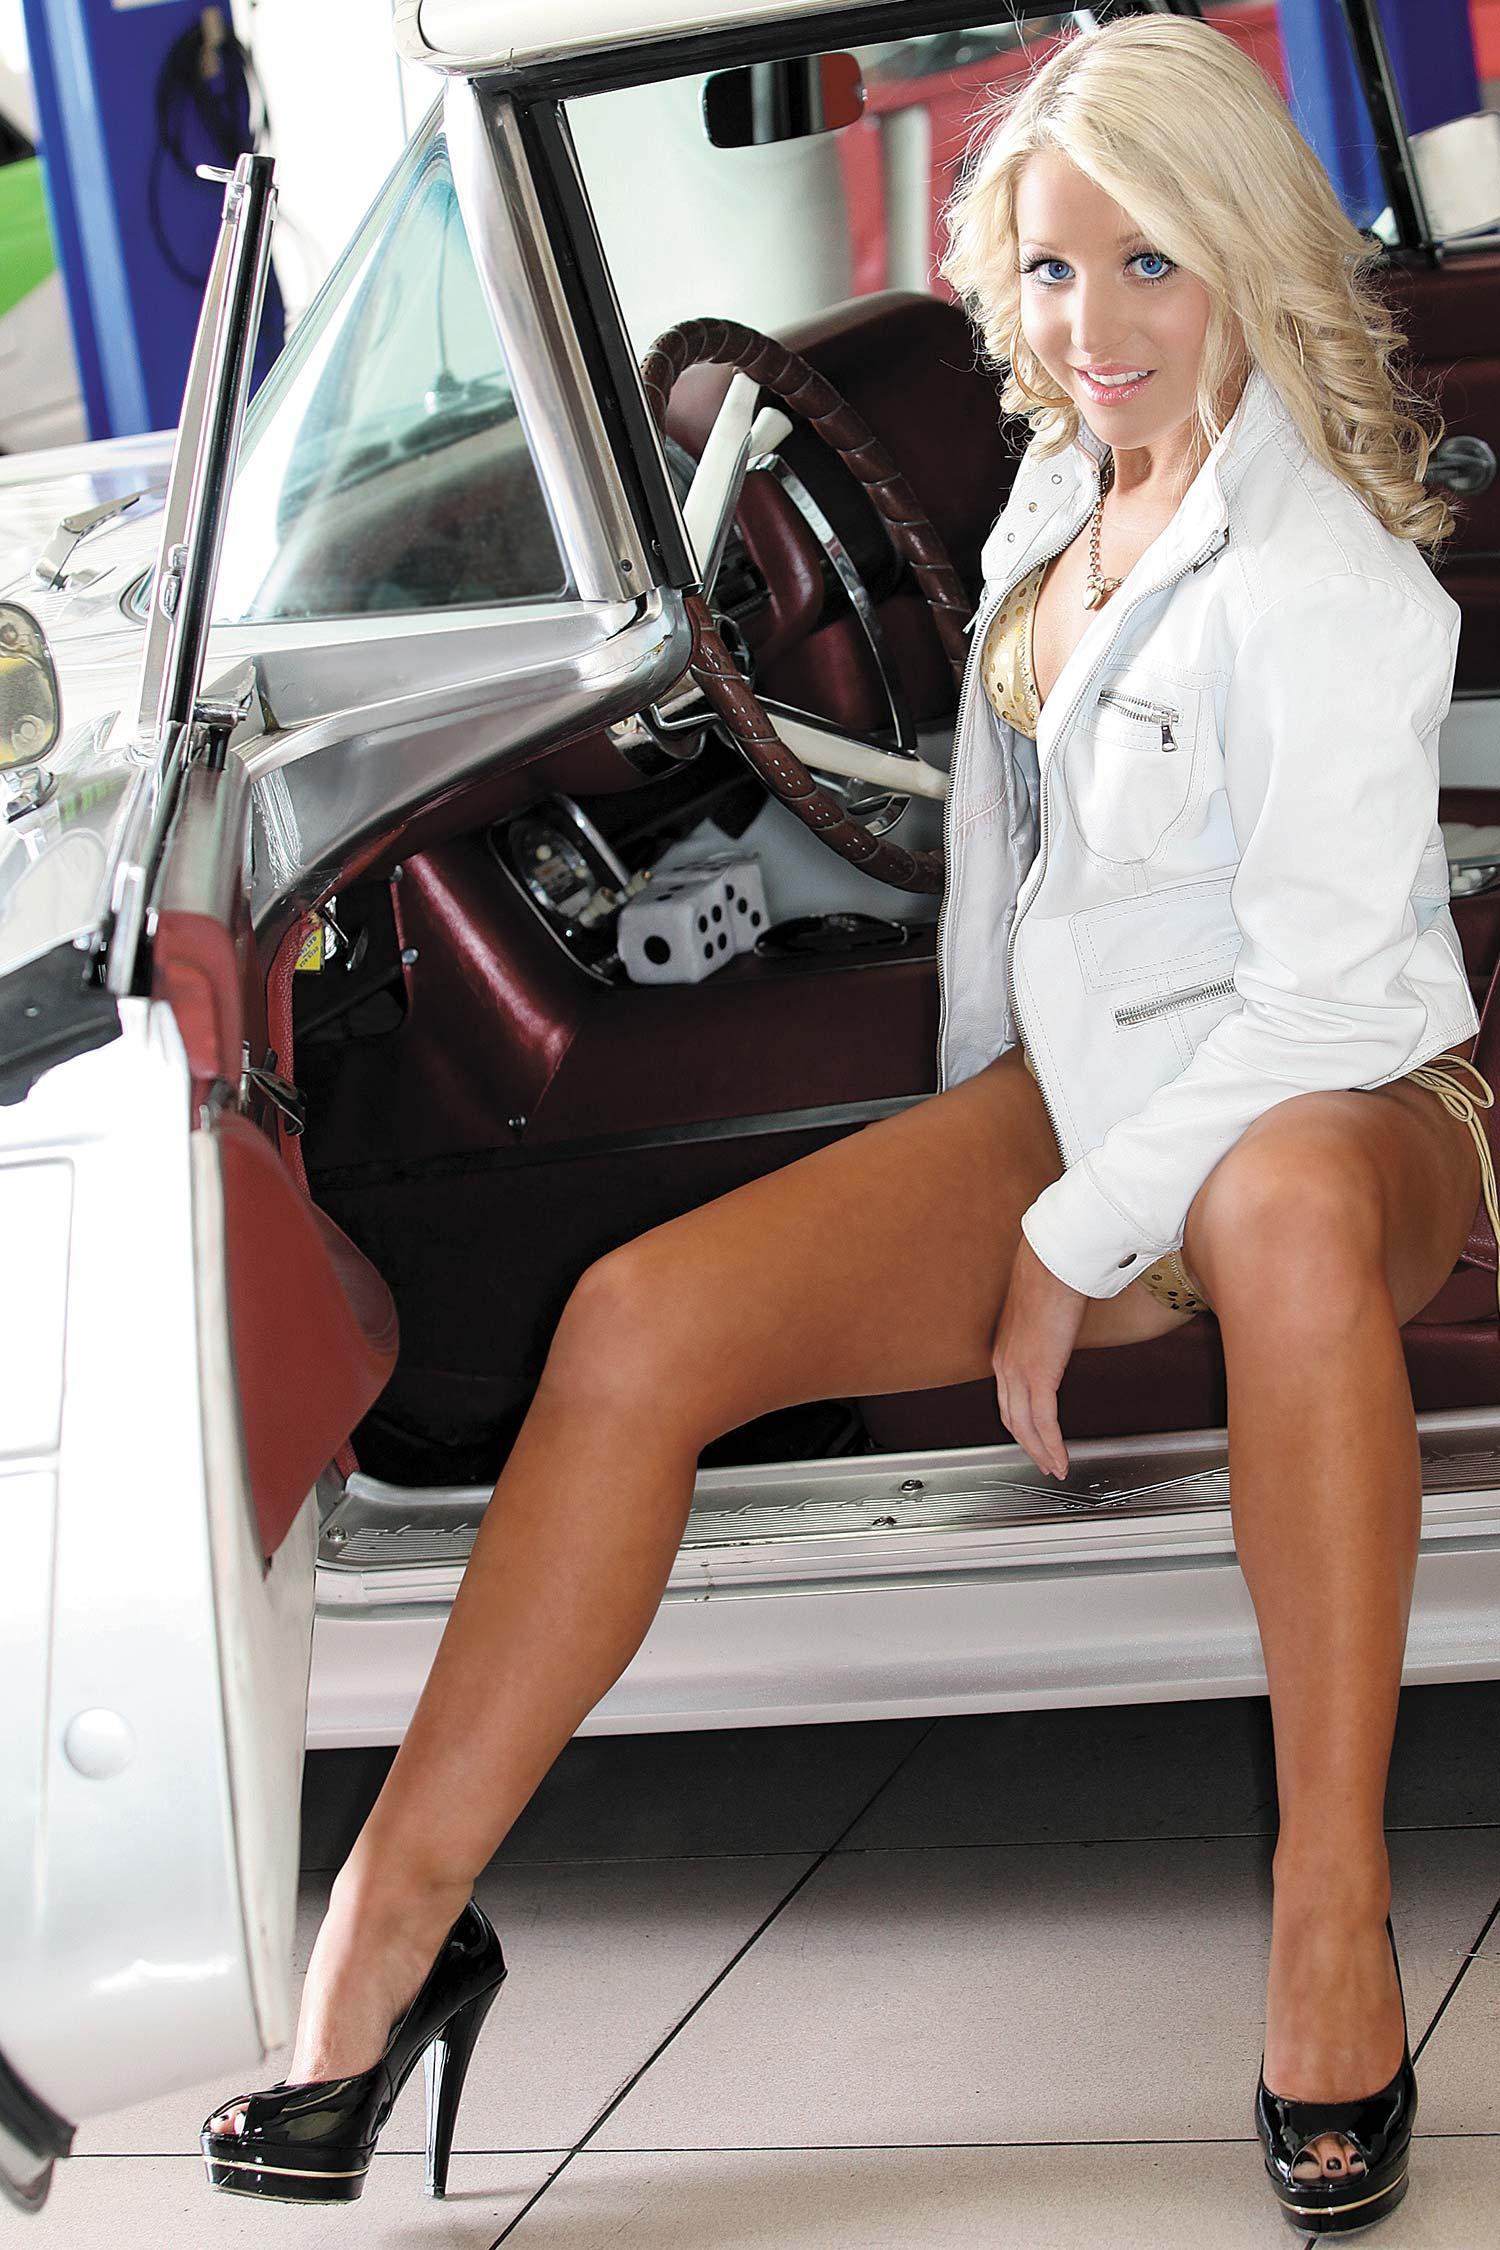 Babes cars Nude Photos 16